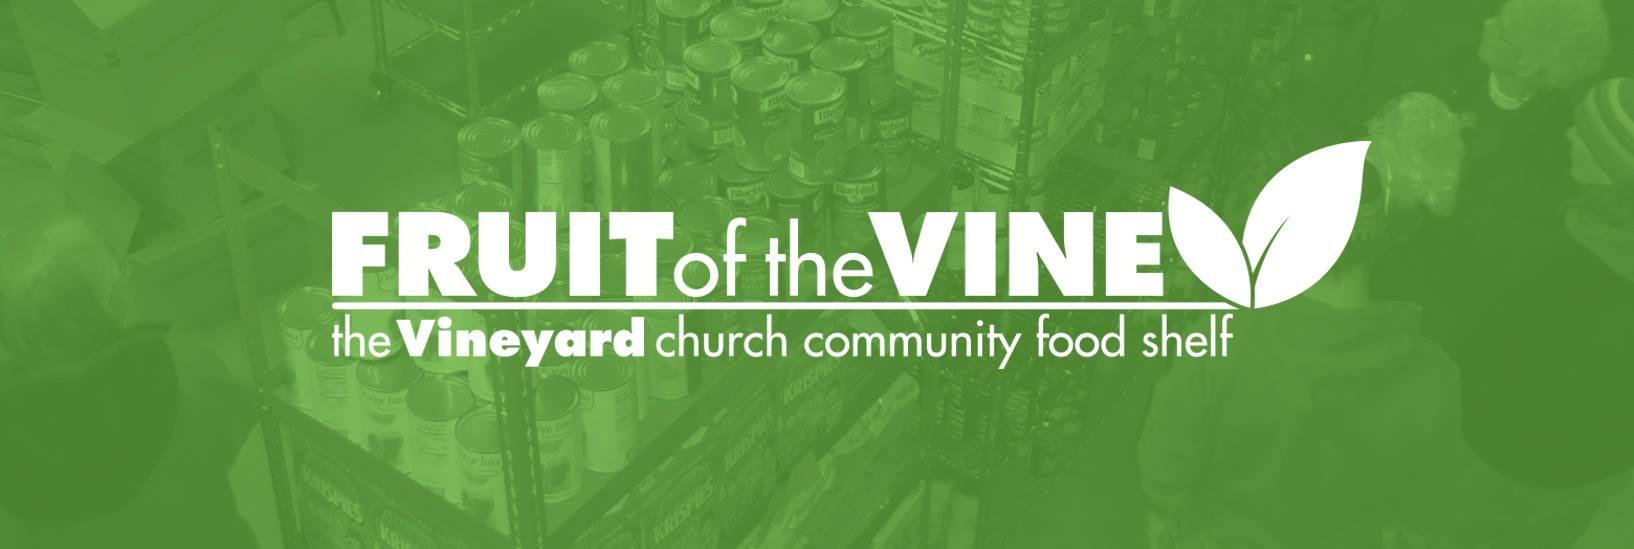 Fruit Of The Vine Food Shelf - The Vineyard Church